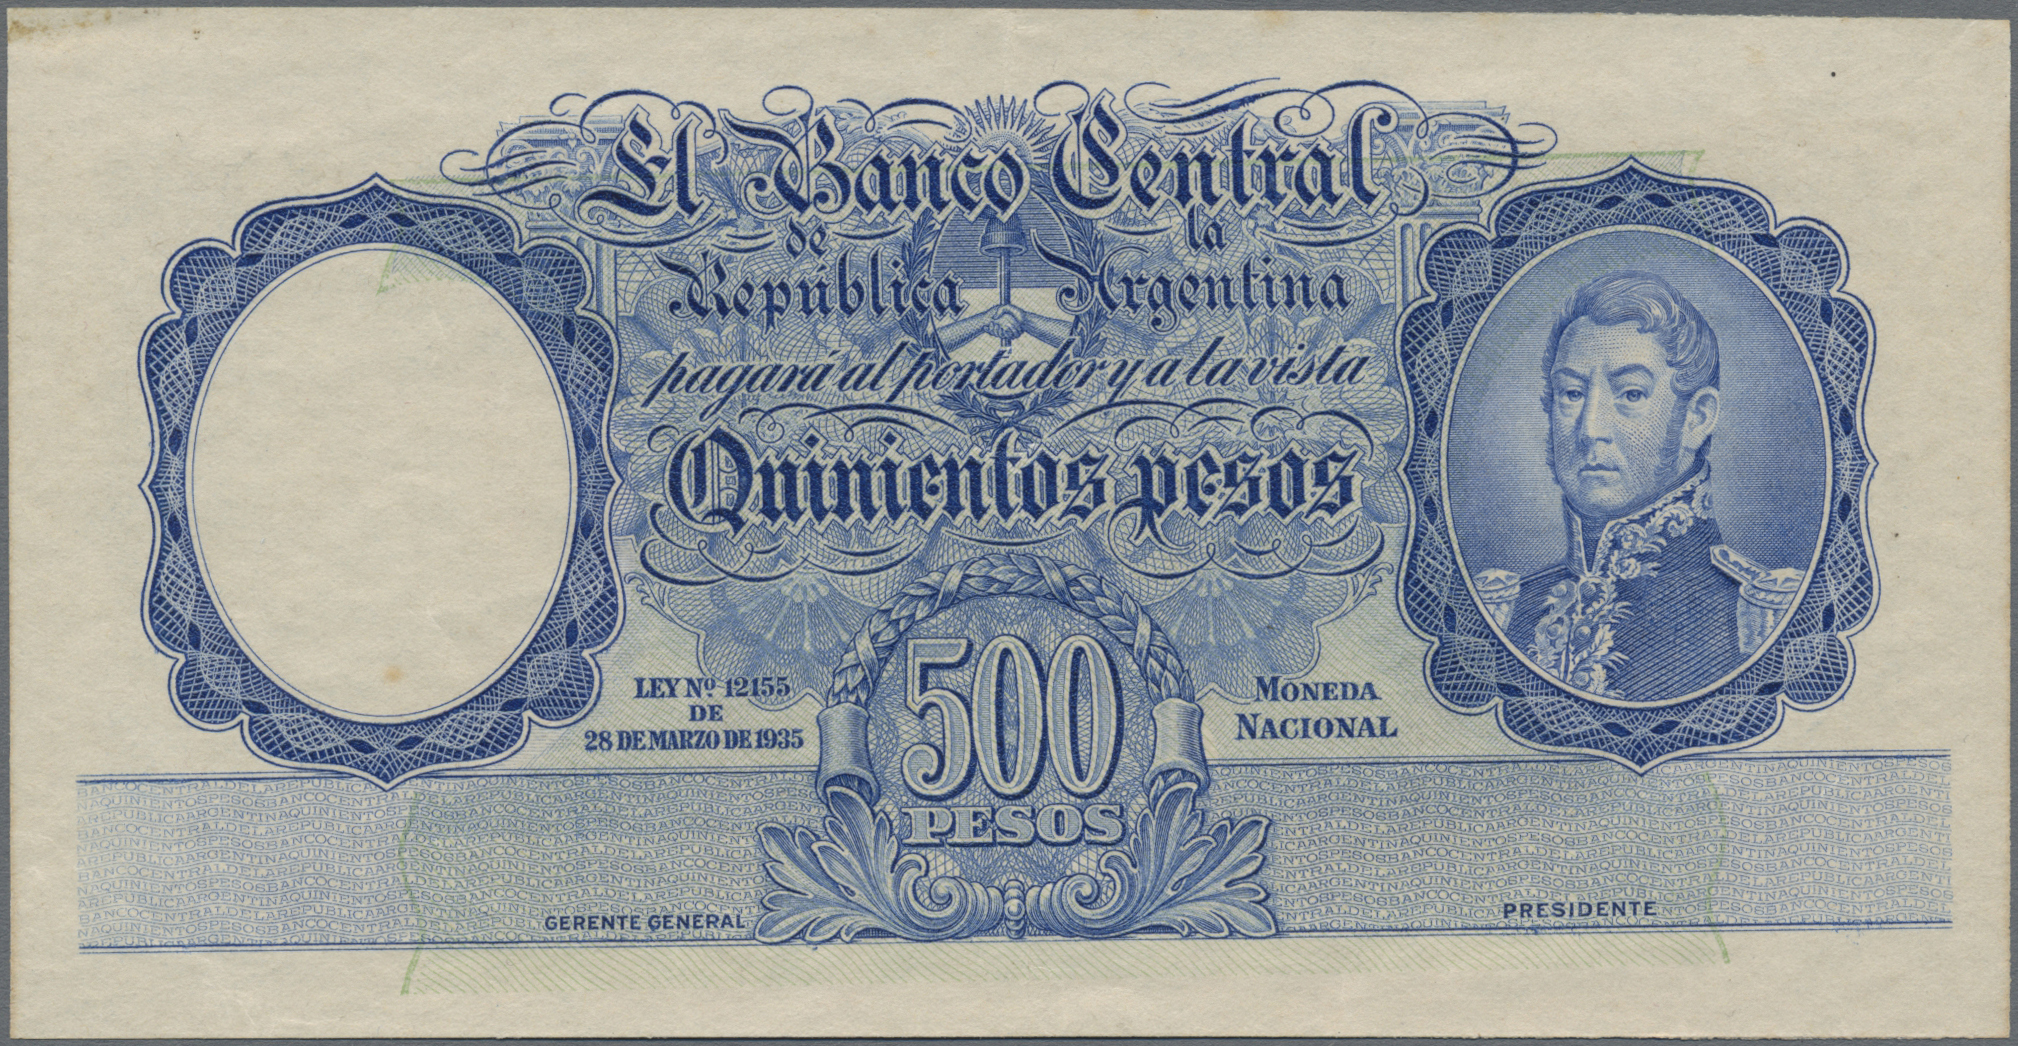 Lot 00012 - Argentina / Argentinien | Banknoten  -  Auktionshaus Christoph Gärtner GmbH & Co. KG 51th Auction - Day 1